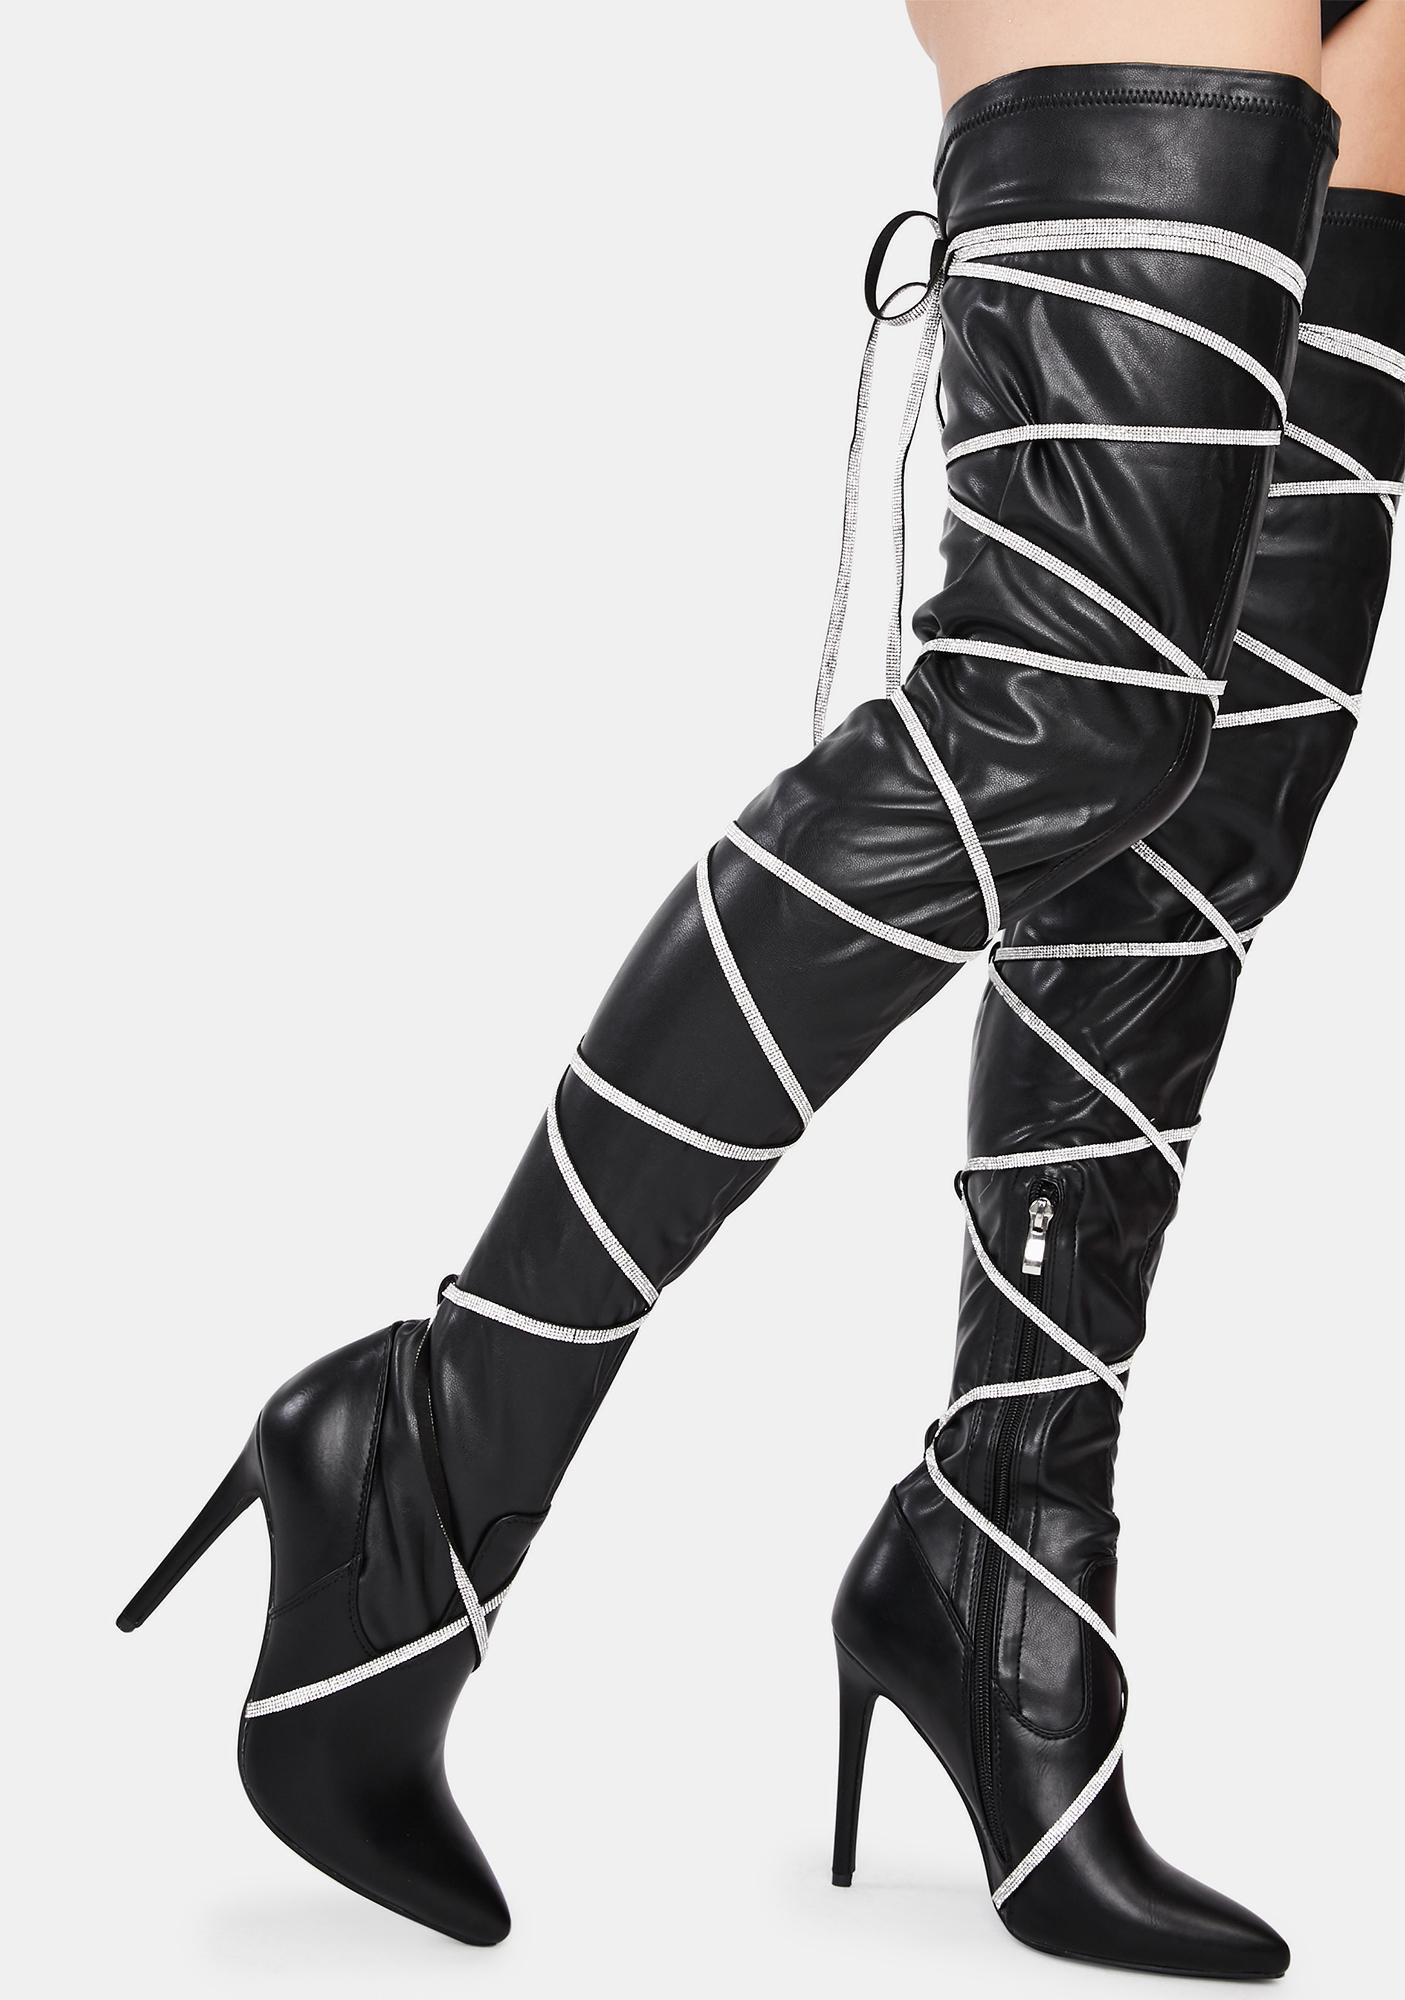 AZALEA WANG Underworld Stiletto Thigh High Boots